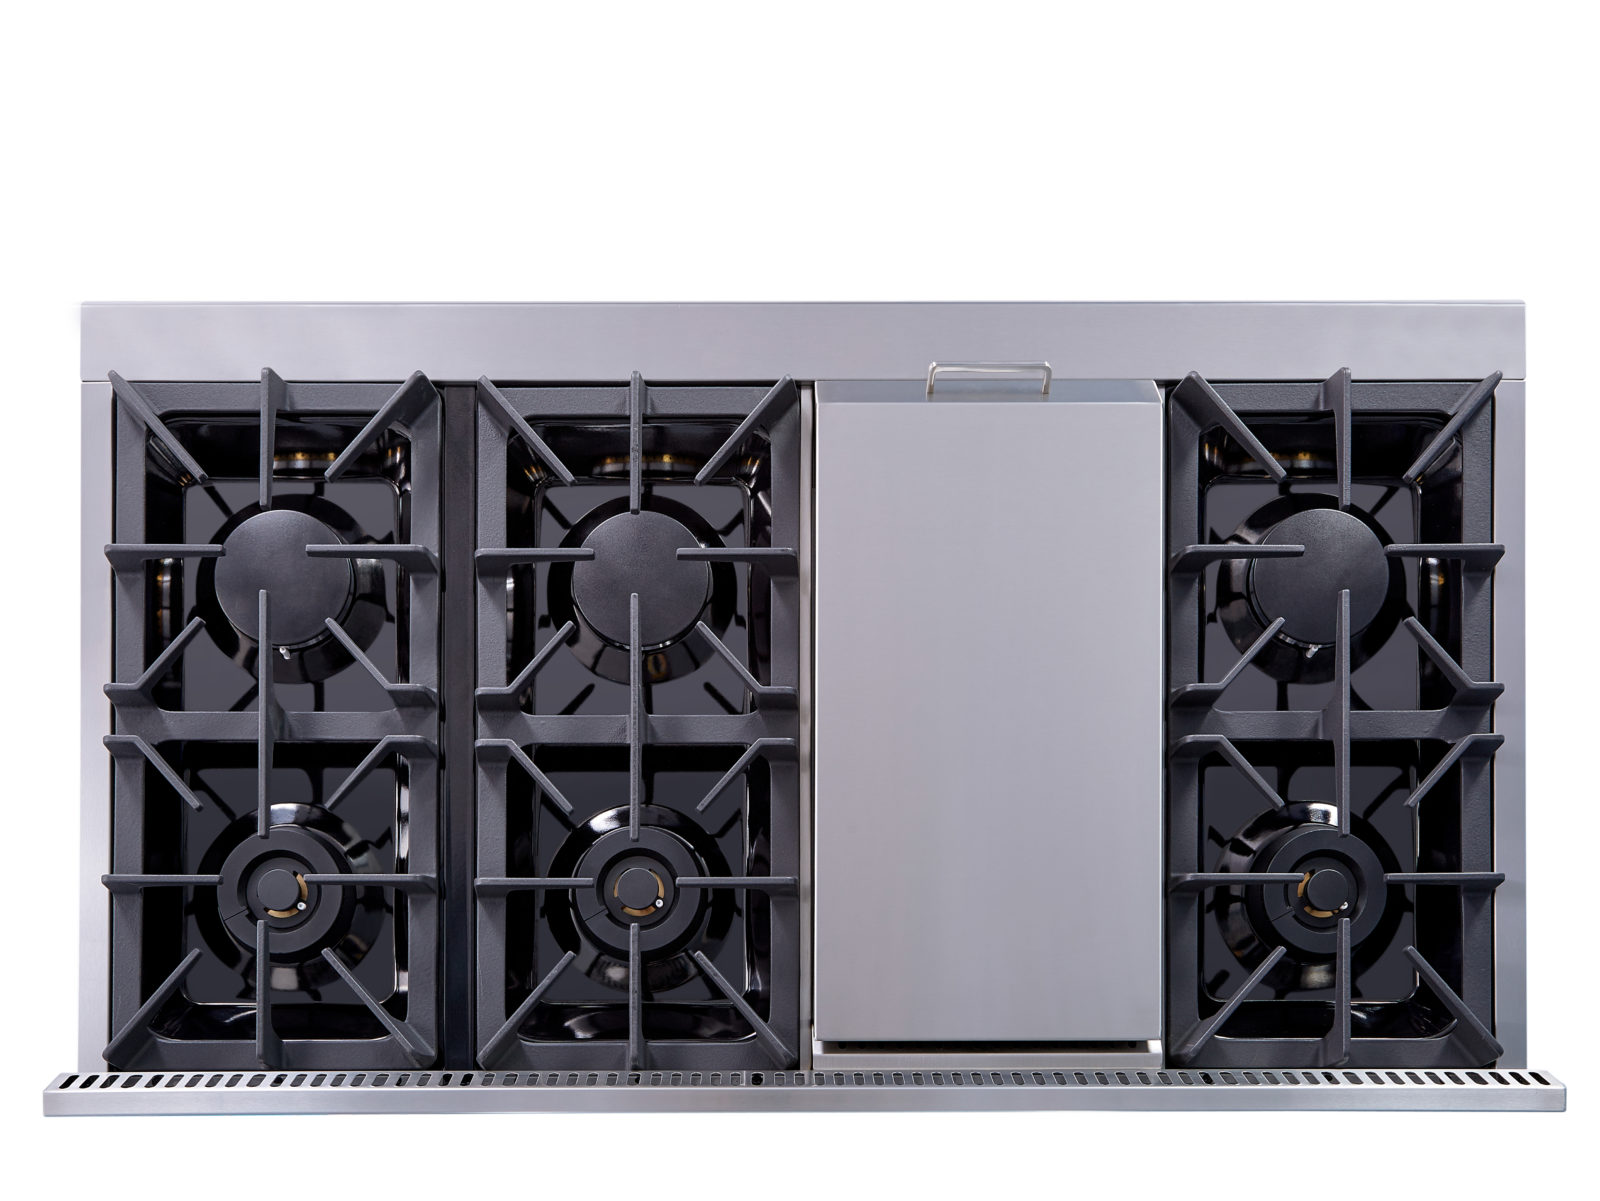 hight resolution of hrg4808u 48 6 burner stainless steel professional gas range back